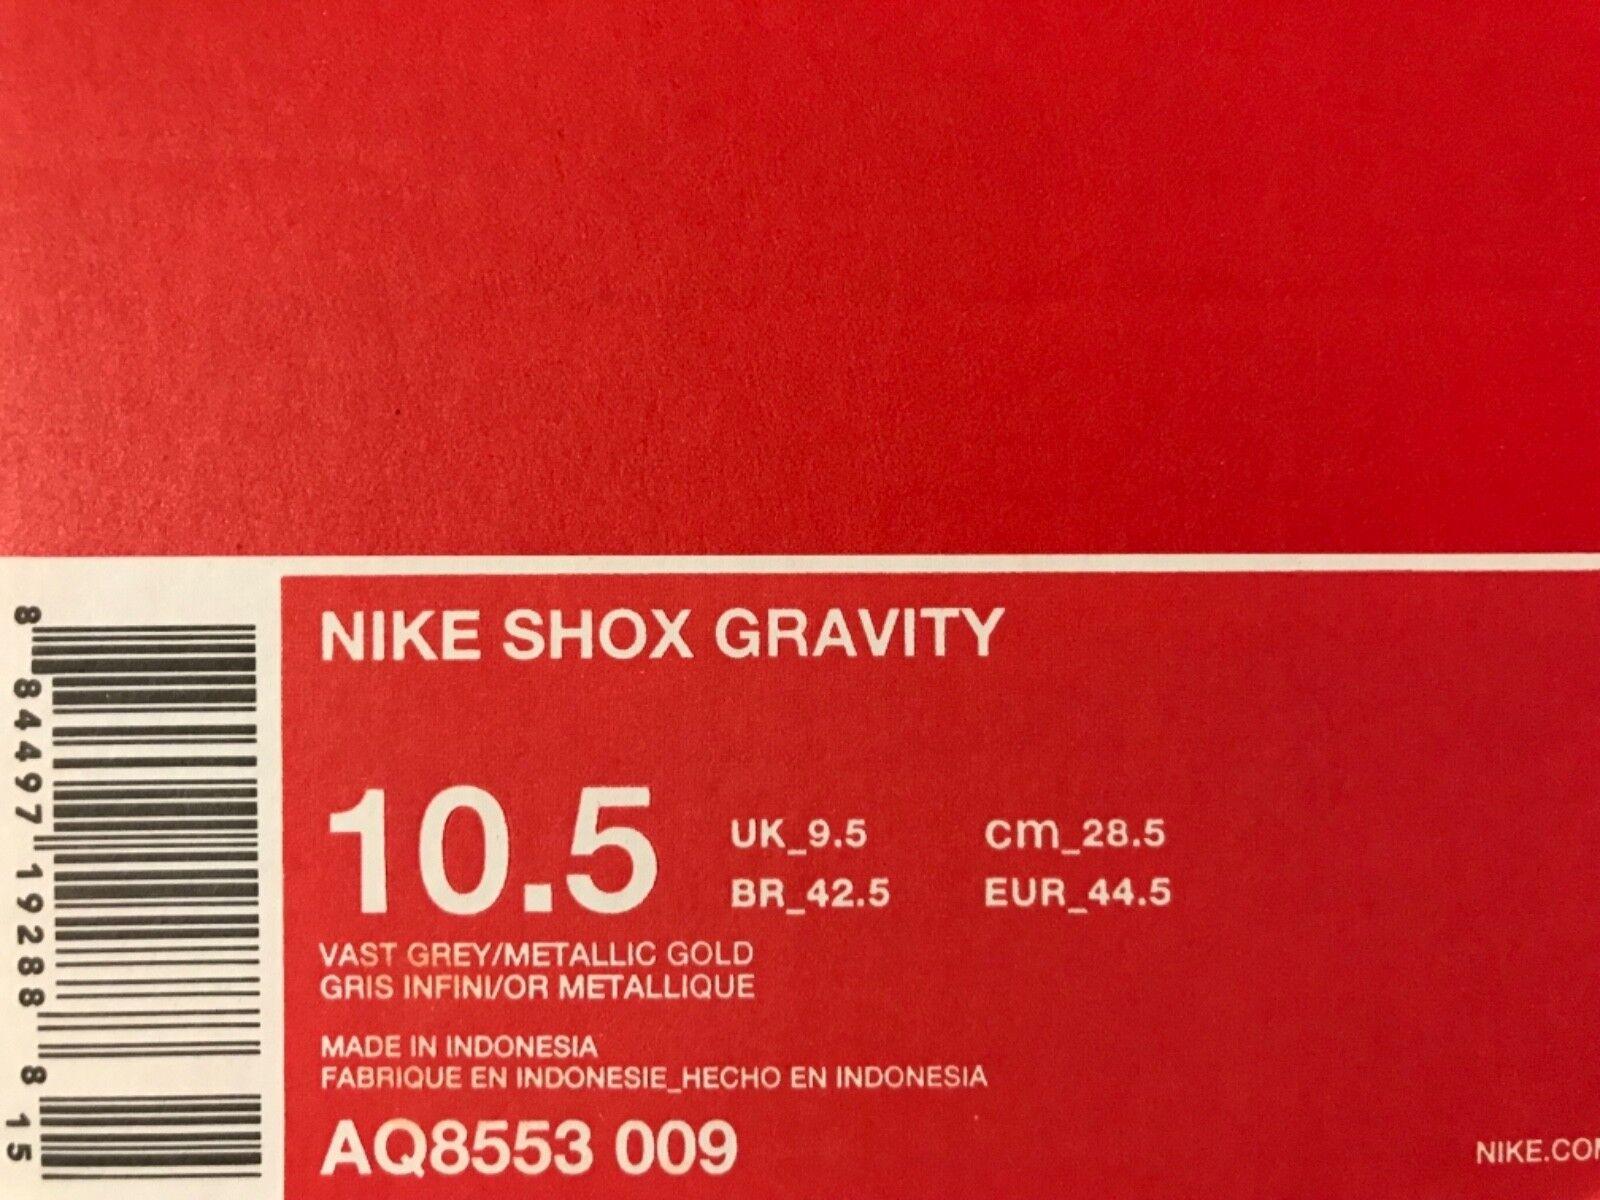 Nike shox schwerkraft riesige graue / metallisches metallisches metallisches gold größe männer 10,5 [aq8553-009] 57c483